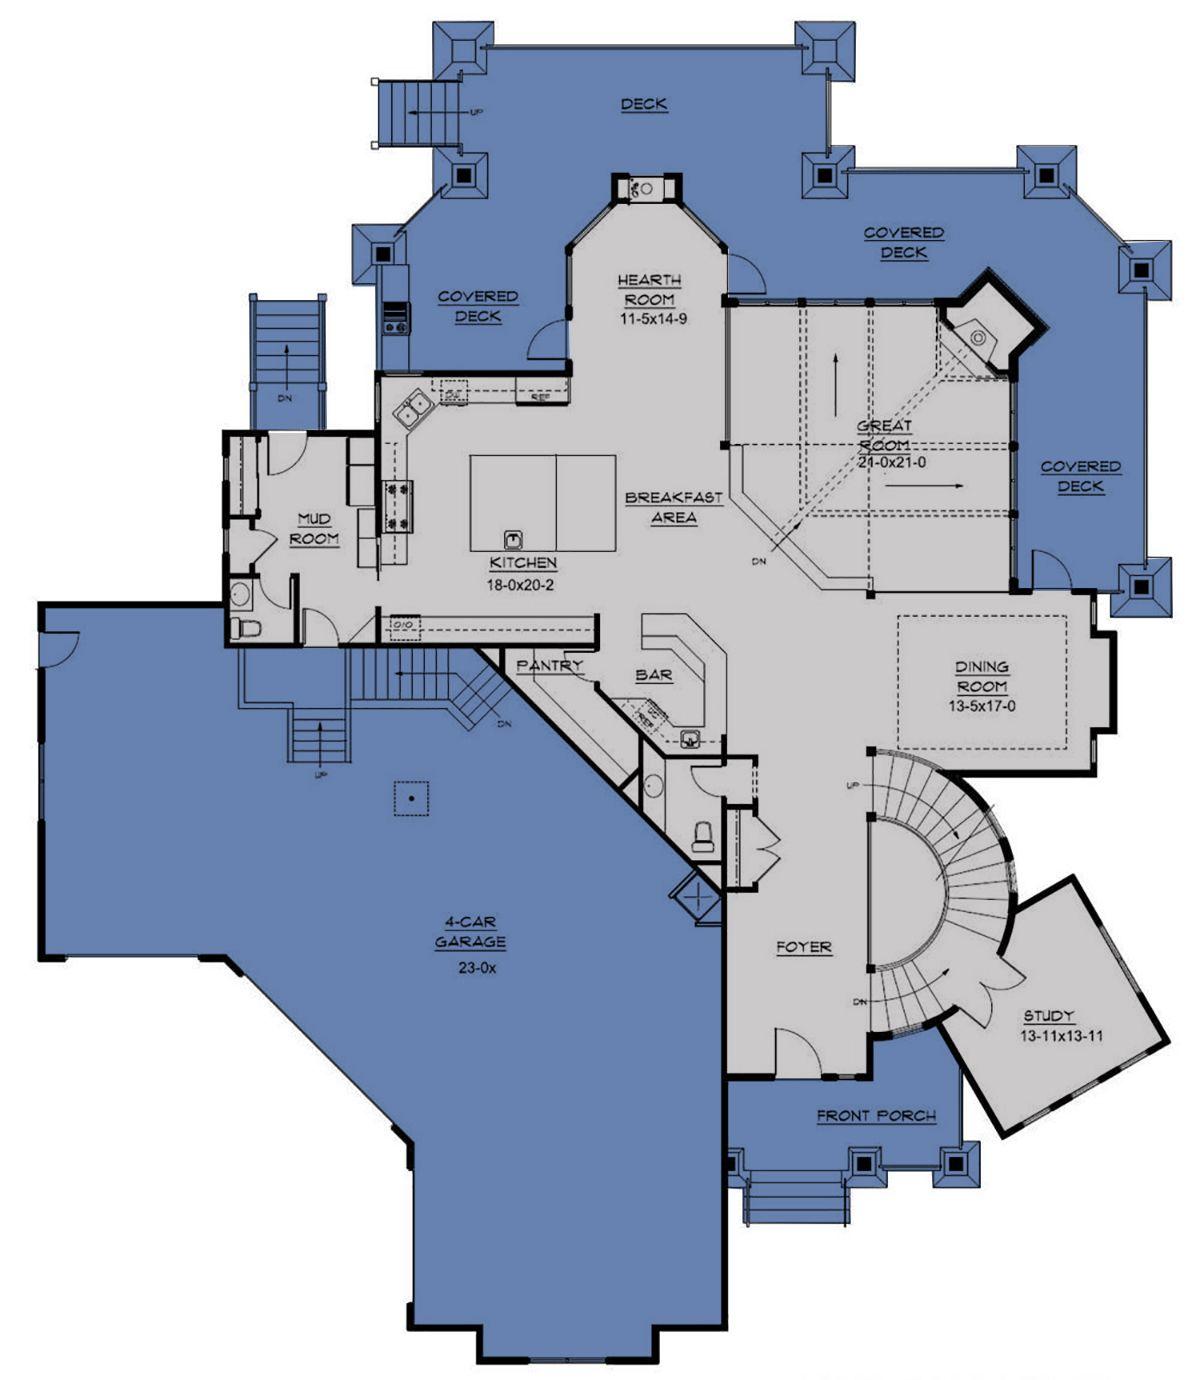 House Plan 5631 00036 Lake Front Plan 6 963 Square Feet 5 Bedrooms 5 5 Bathrooms Lake House Plans House Plans Lake House